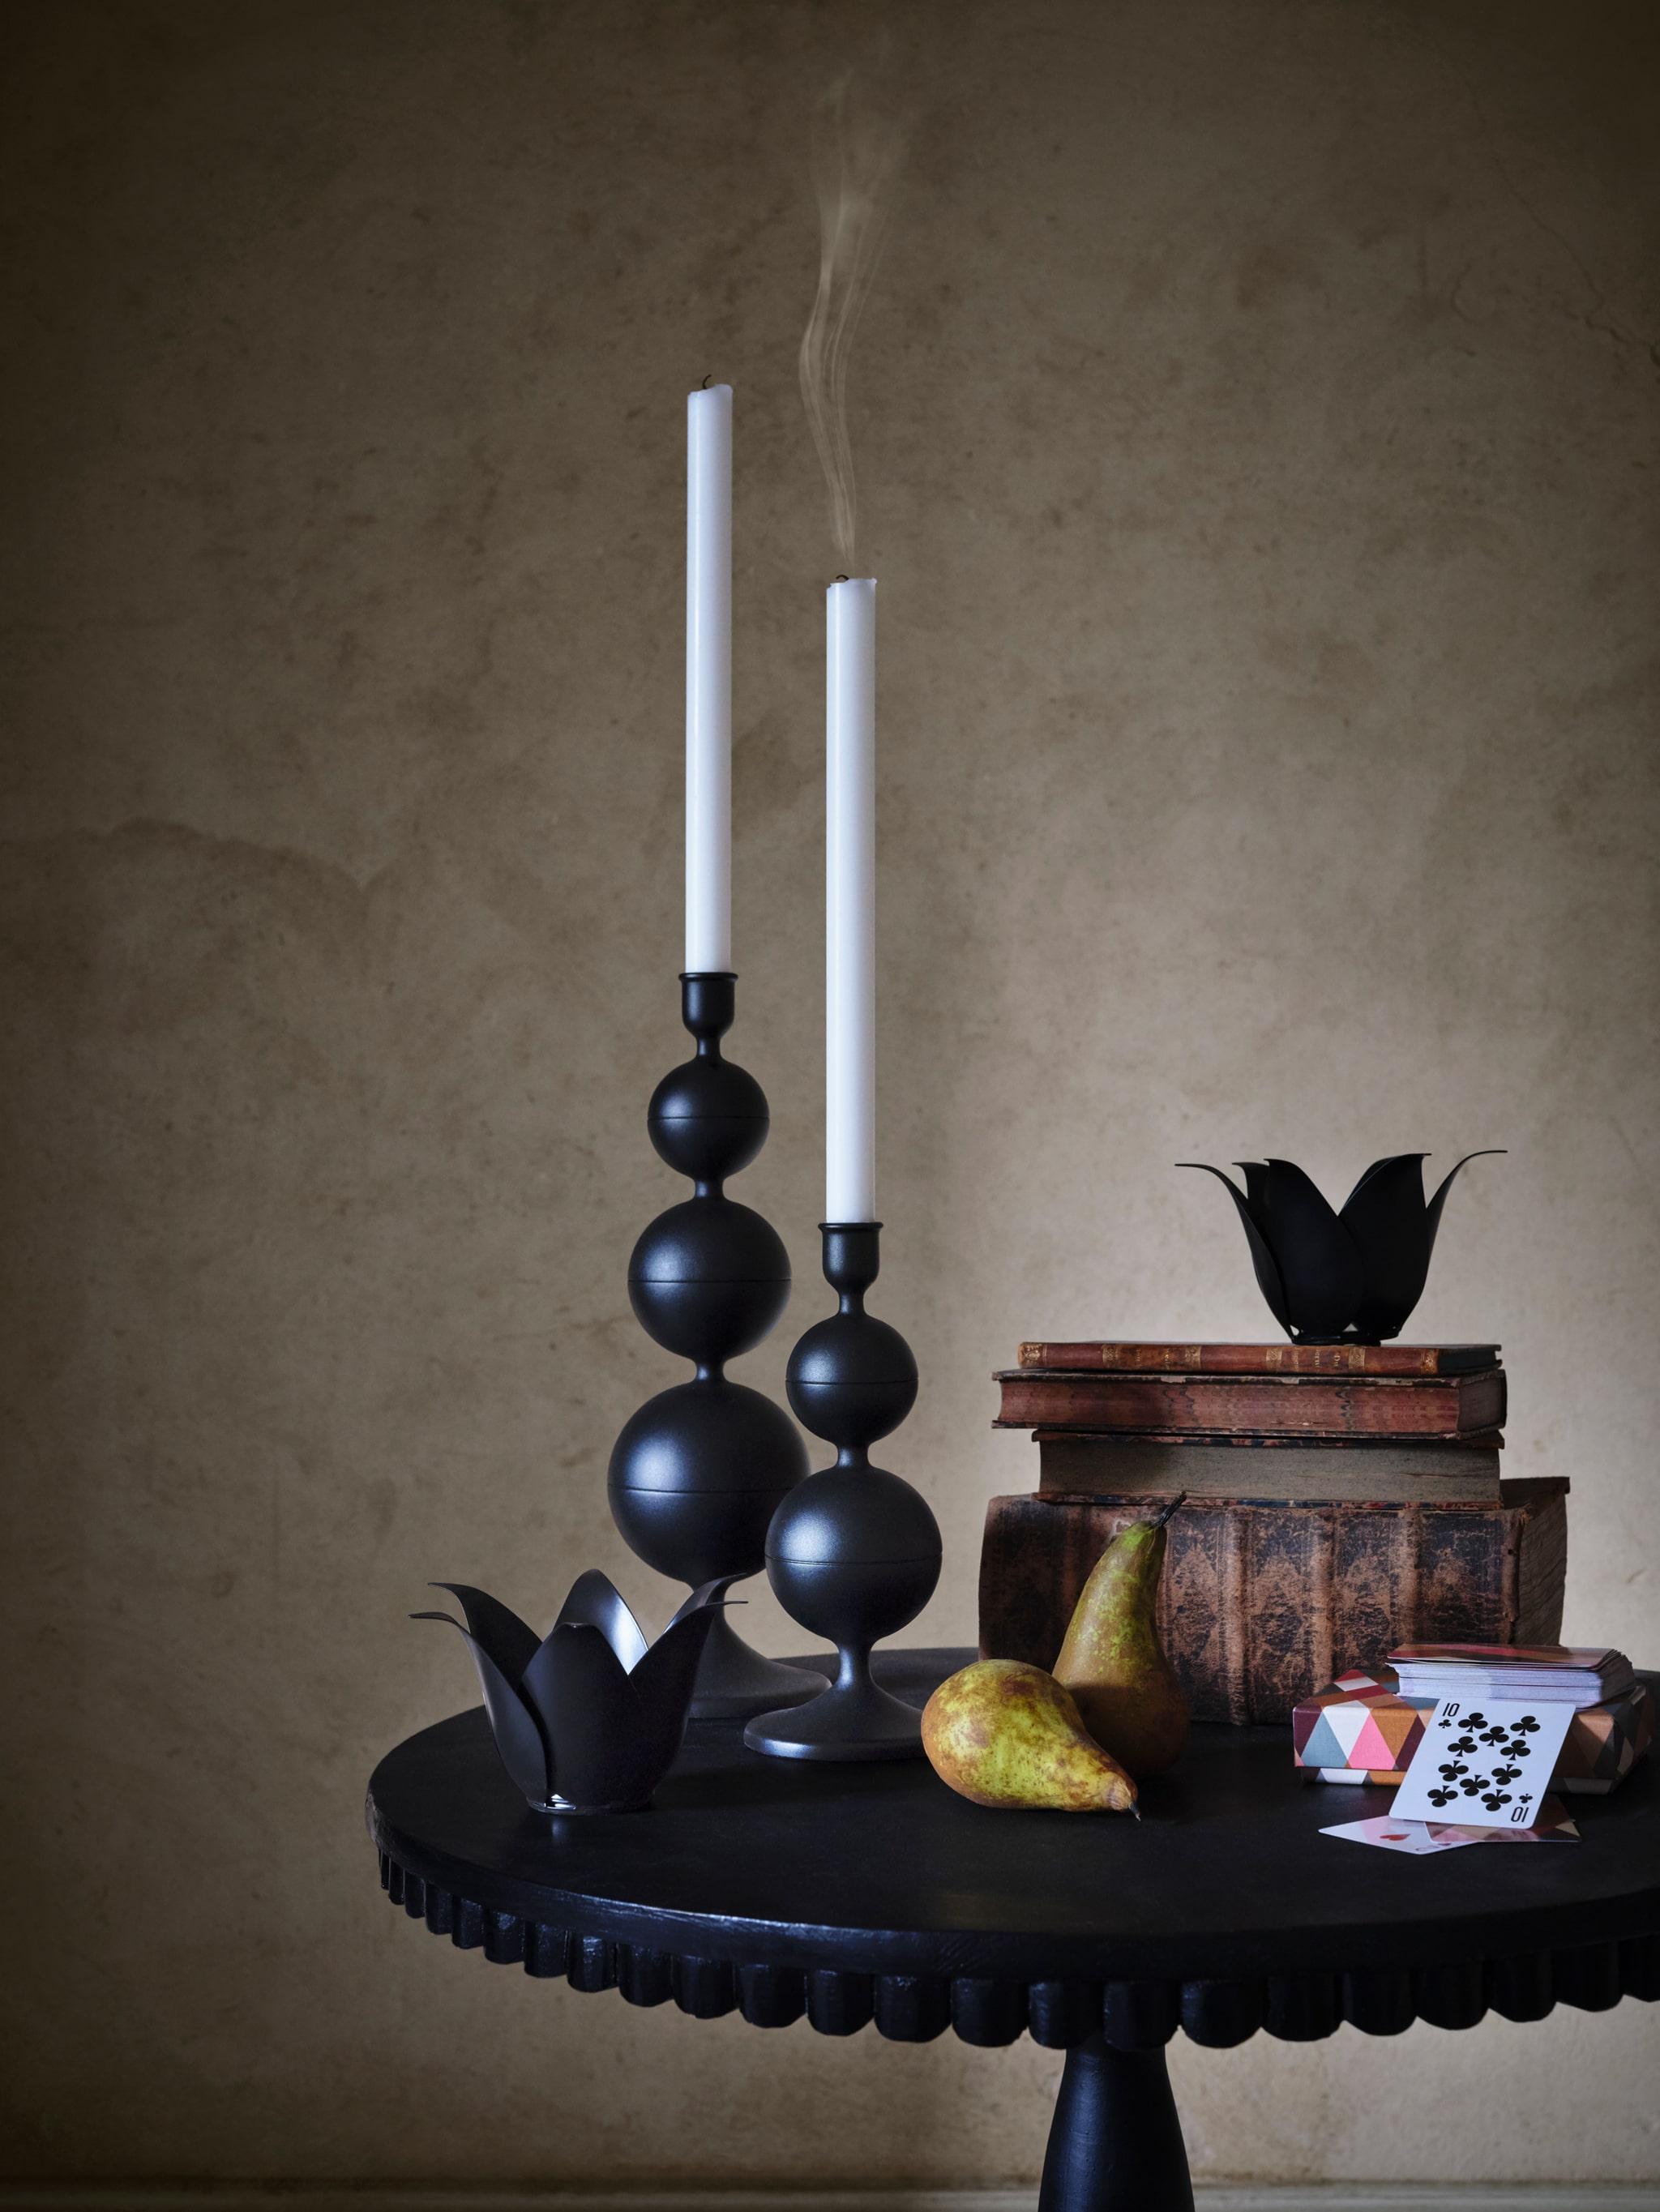 Dua tempat lilin DEKORERA warna hitam berdiri di atas meja hitam, dengan pir dan tumpukan buku di sebelahnya.